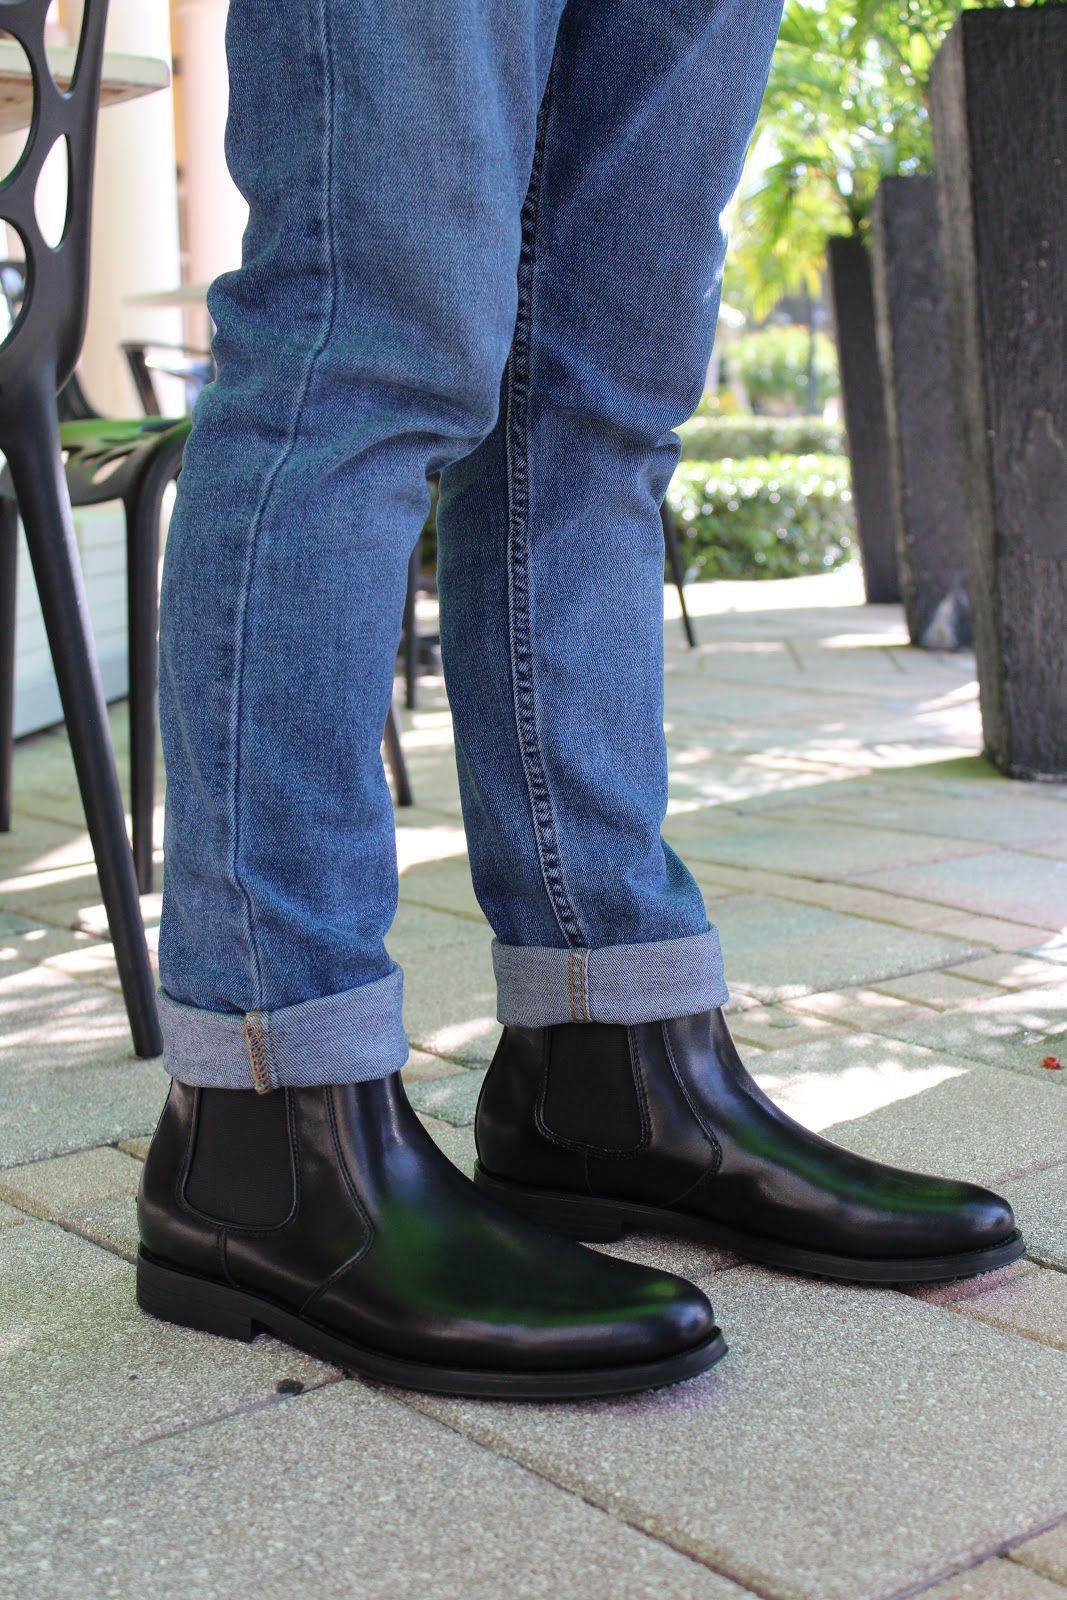 Dockers Ashford Men S Black Dress Shoes Men Dress With Boots Kitchen Shoes [ 1600 x 1067 Pixel ]